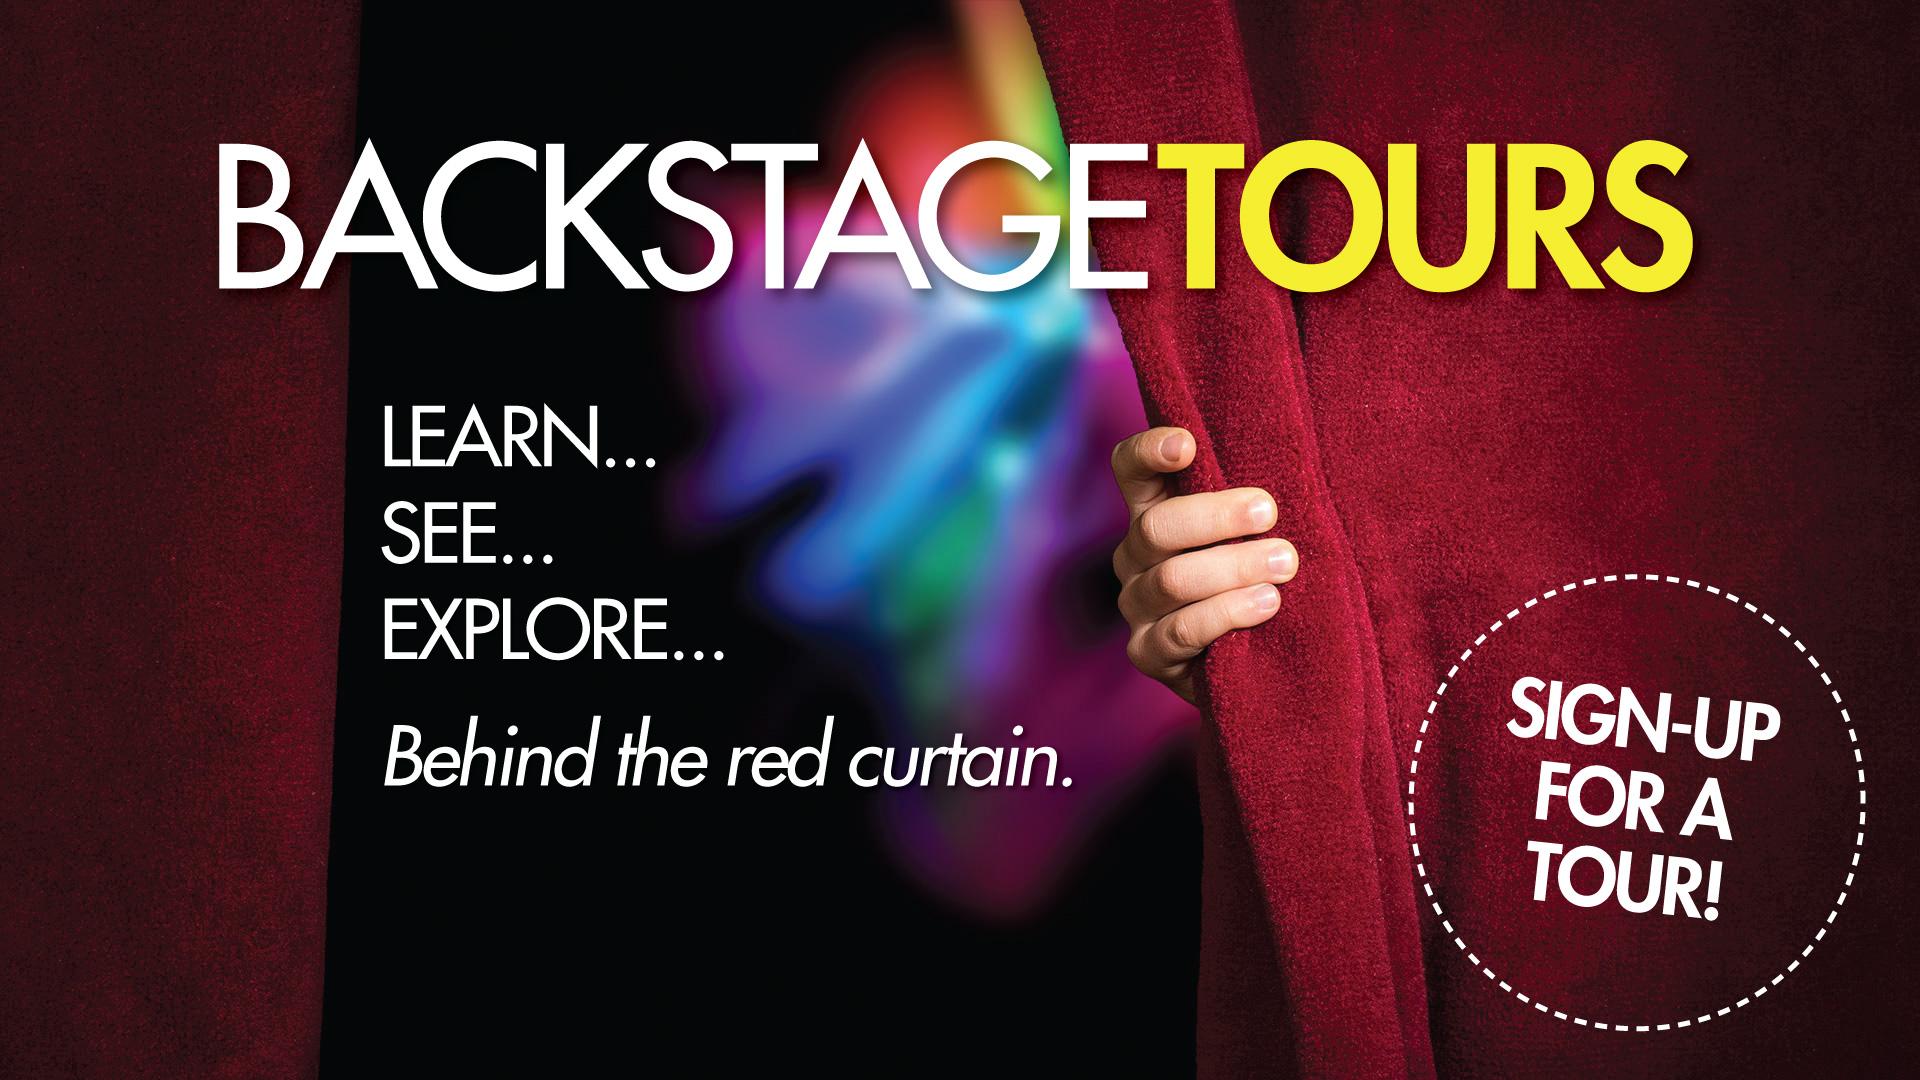 backstage-tours-screen-1920x1080.jpg